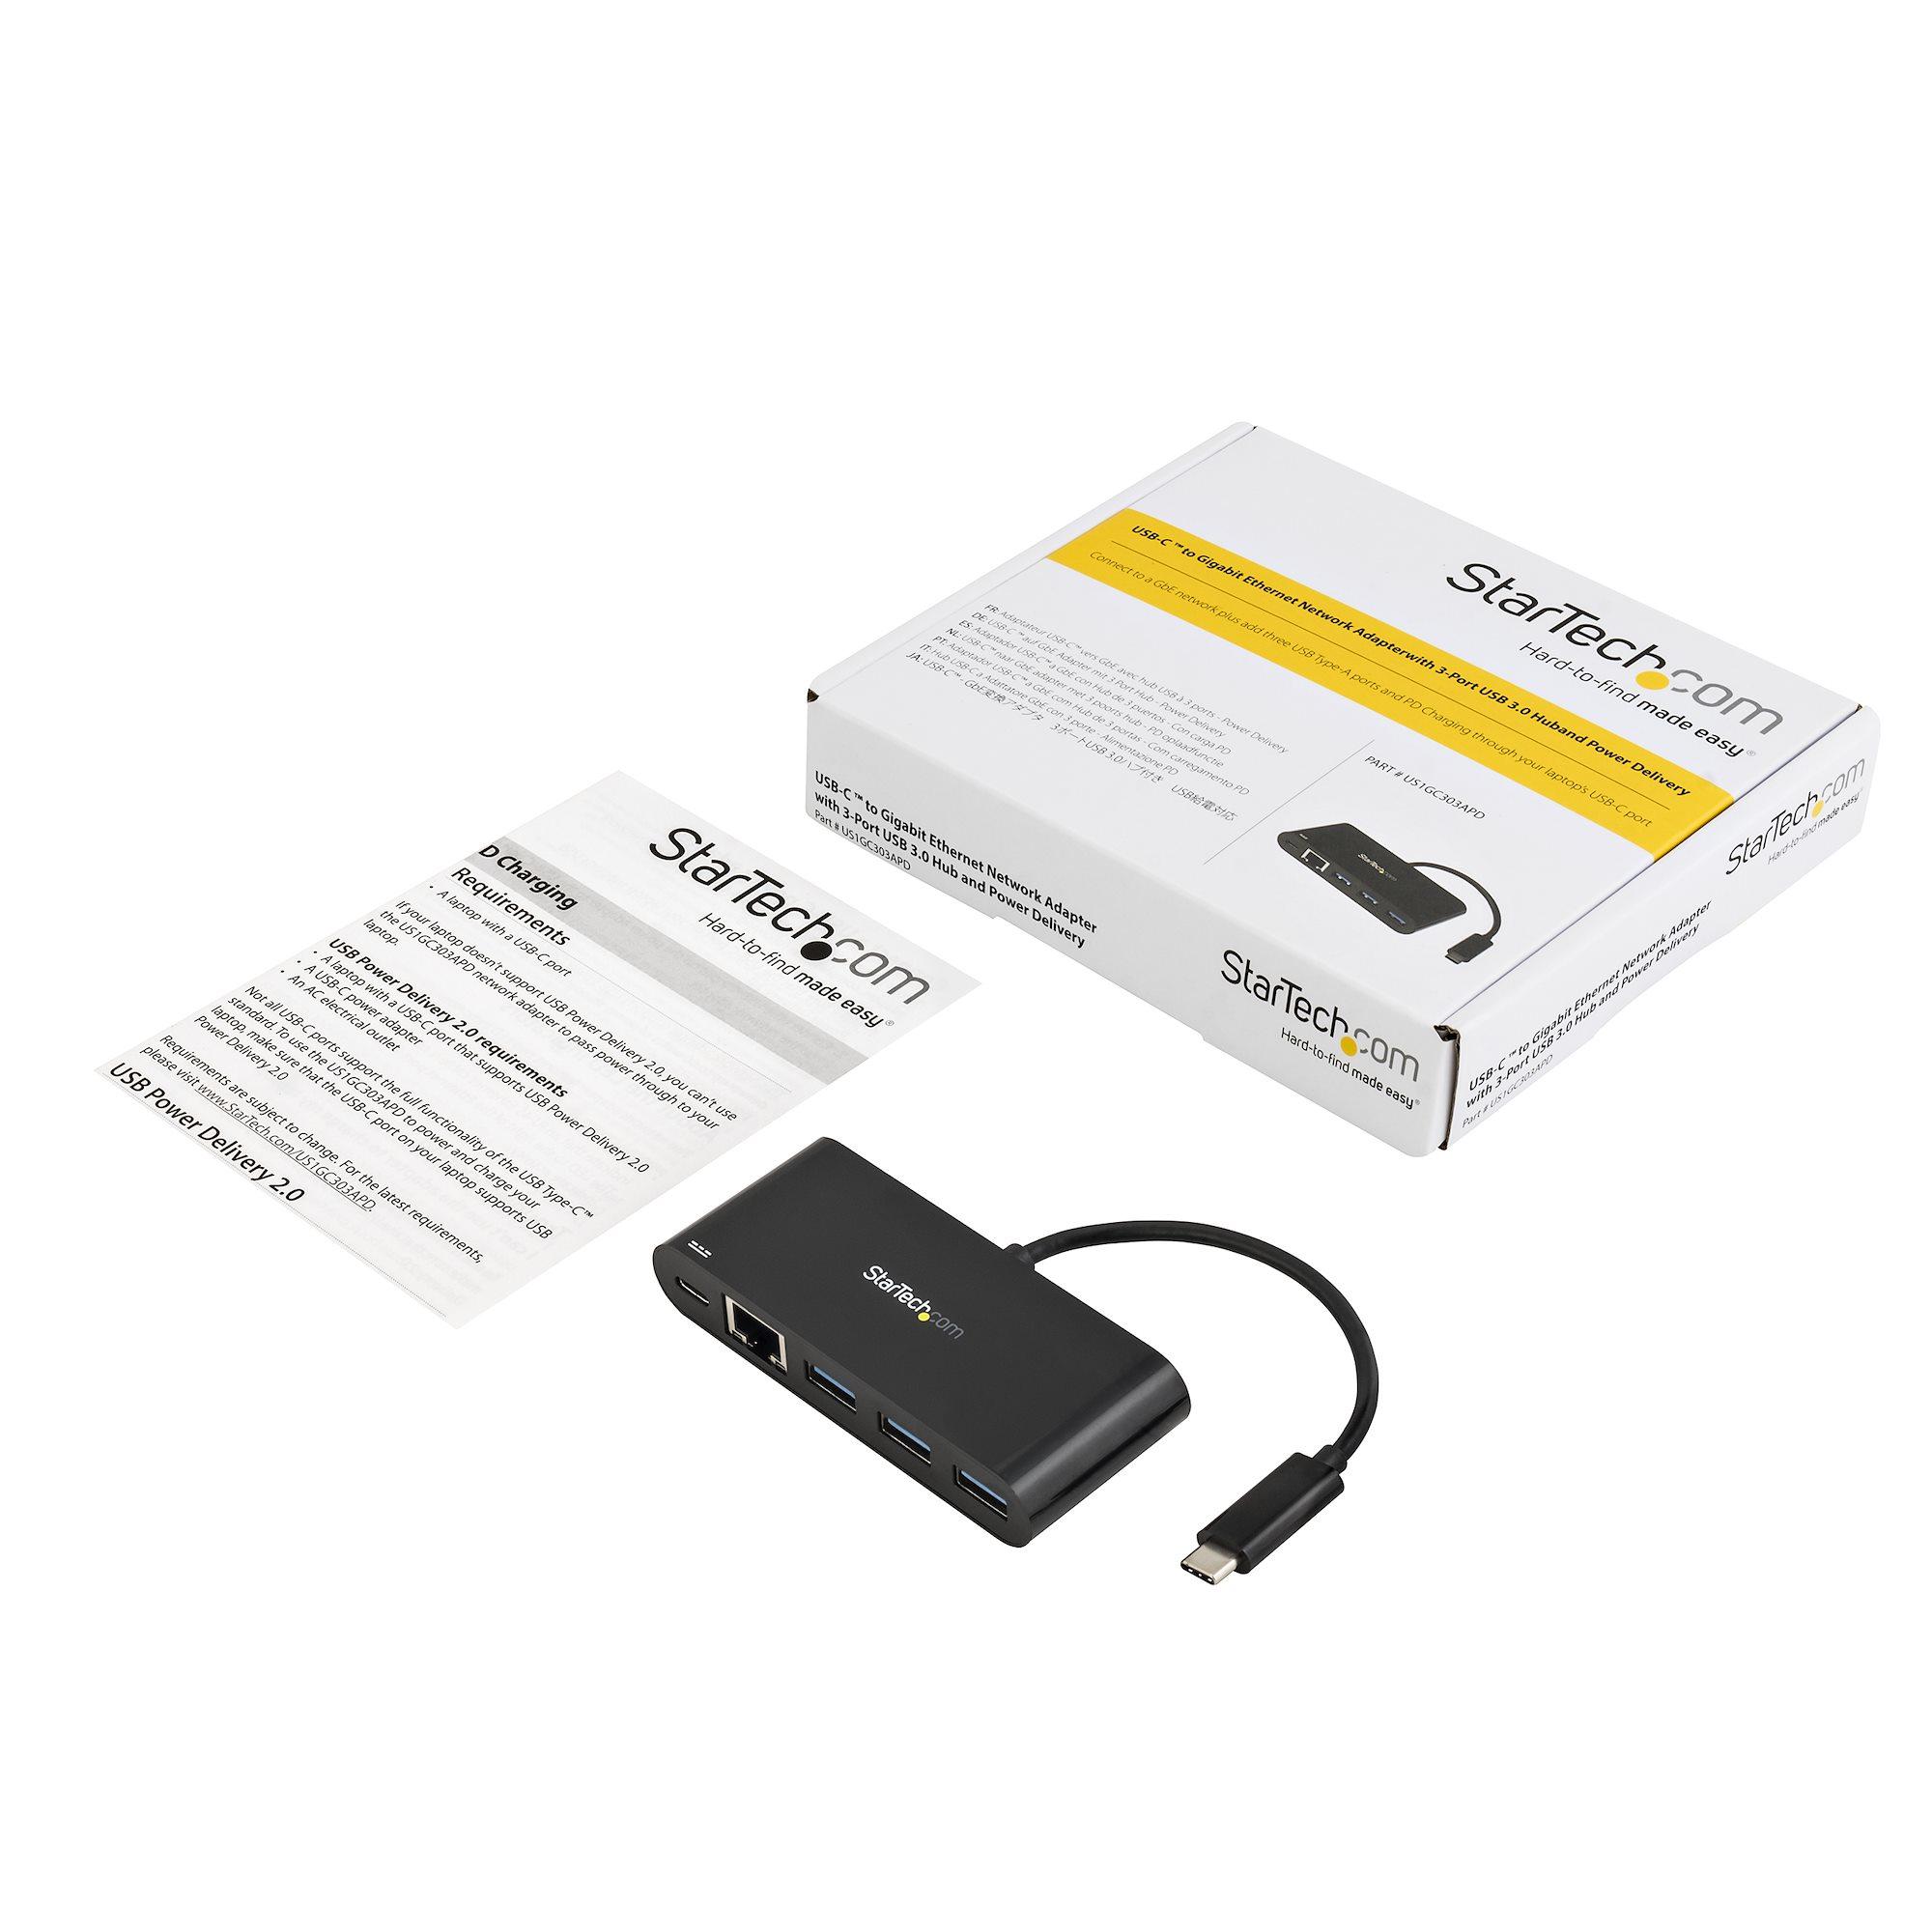 USB-C naar Ethernet Adapter (incl. 3-poort USB 3.0 Hub)